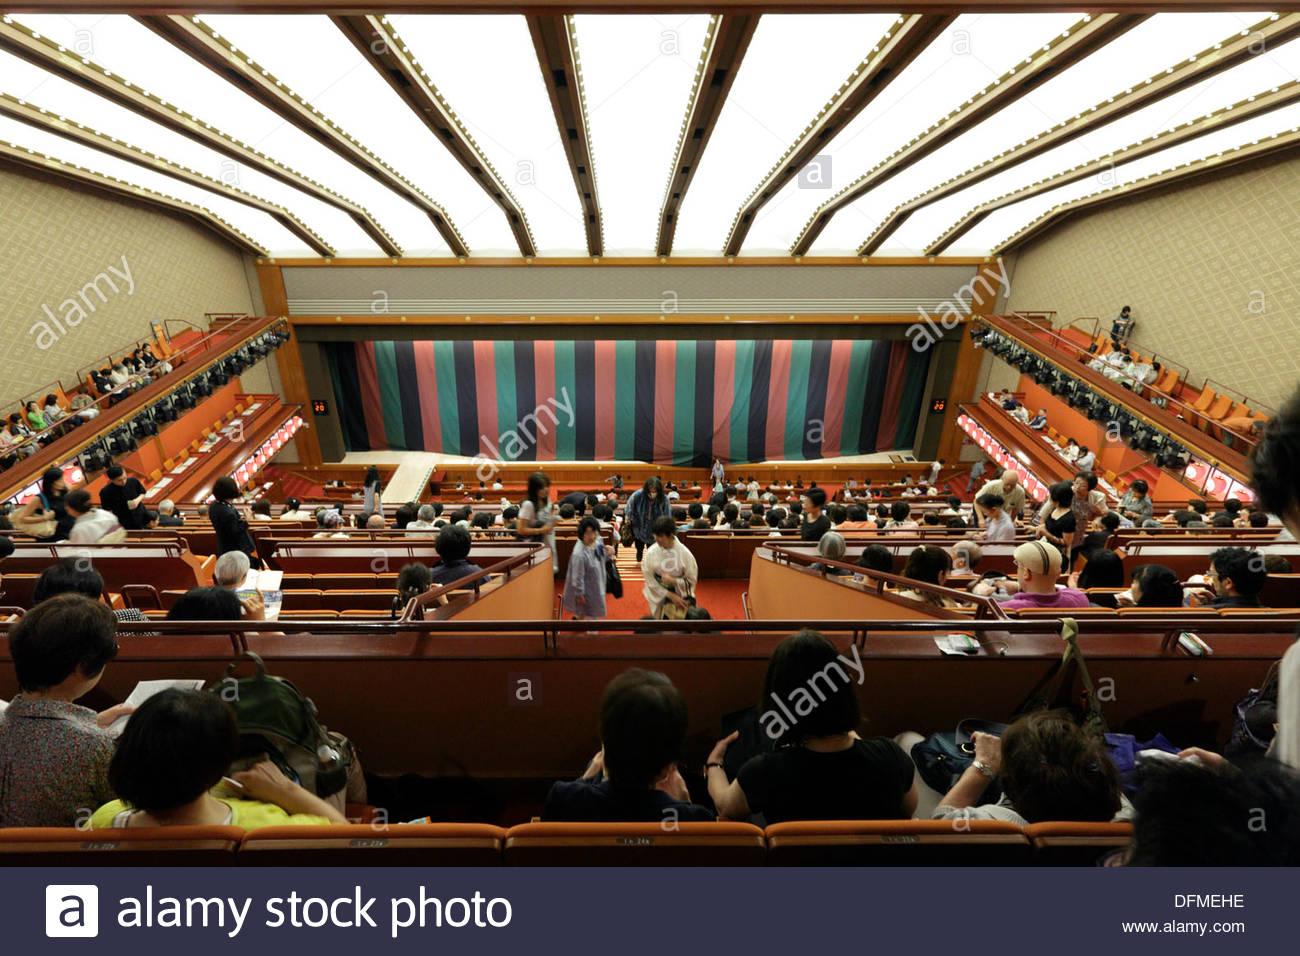 Kabuki theater in Higashi Ginza Tokyo Japan Newly opened in May 2013 designed by Kengo Kuma - Stock Image